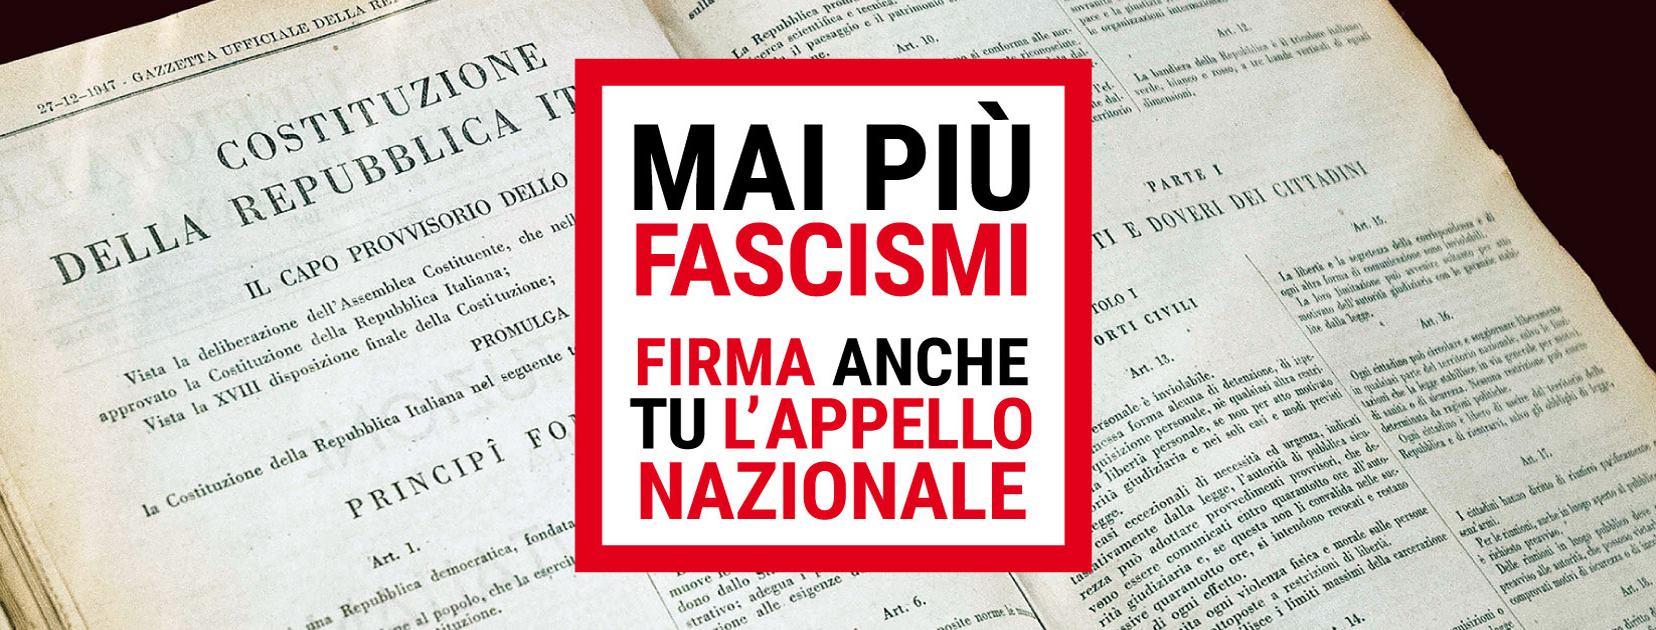 banner_appello_nofascismo